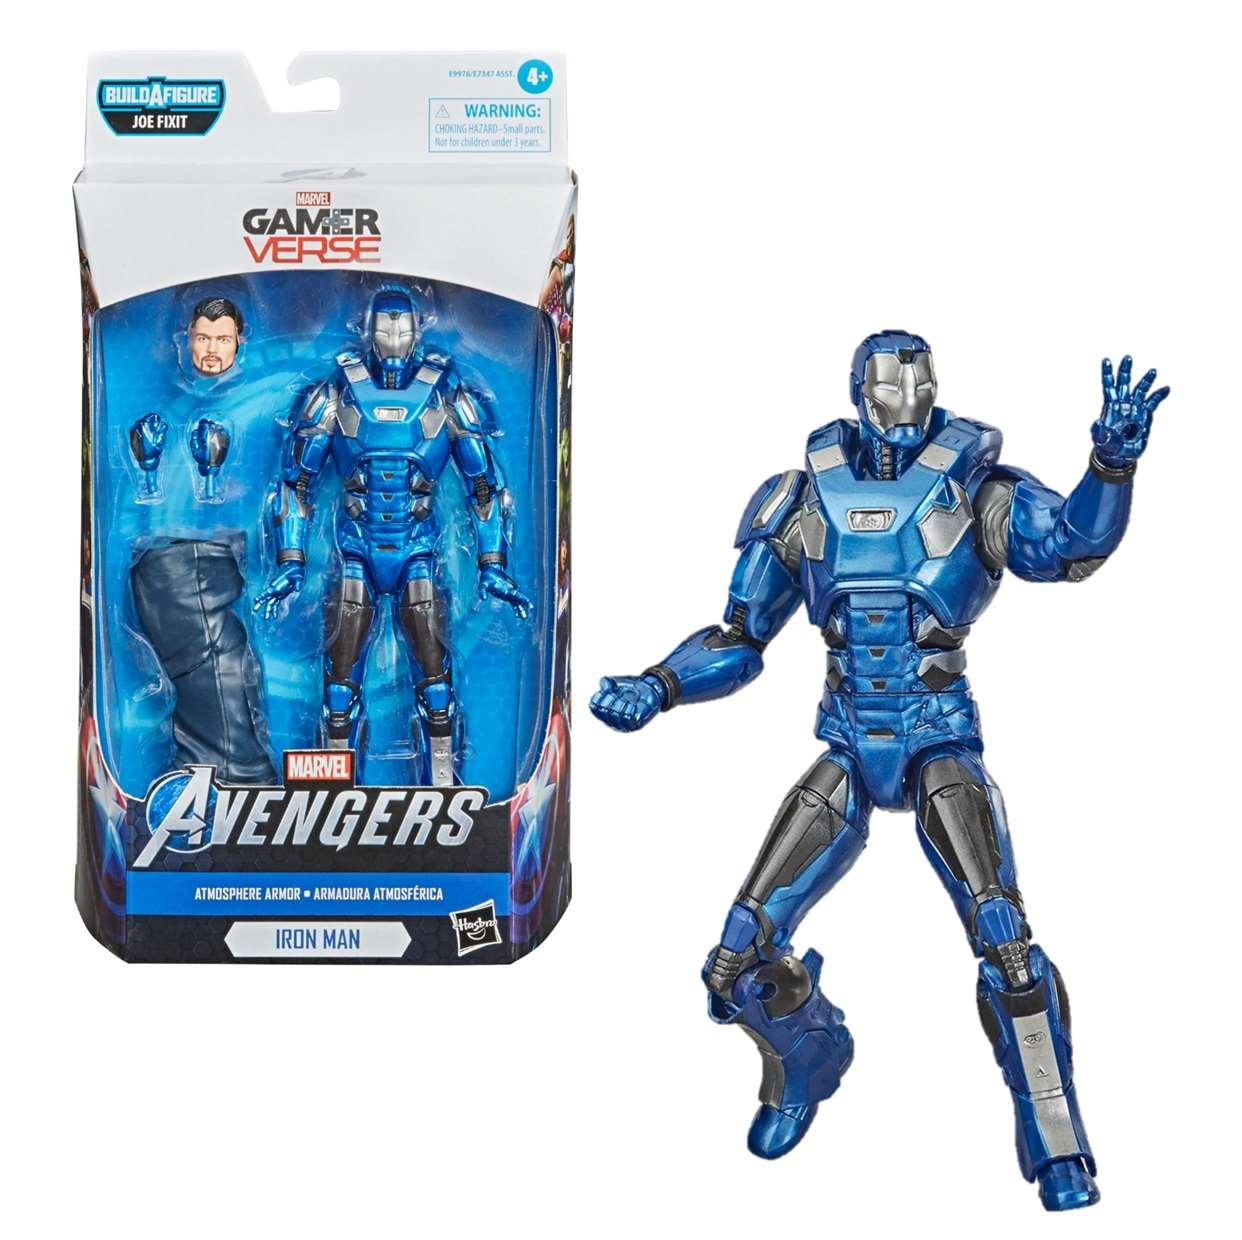 Iron Man Atmosphere Armor Figura Avengers Gamerverse Legends